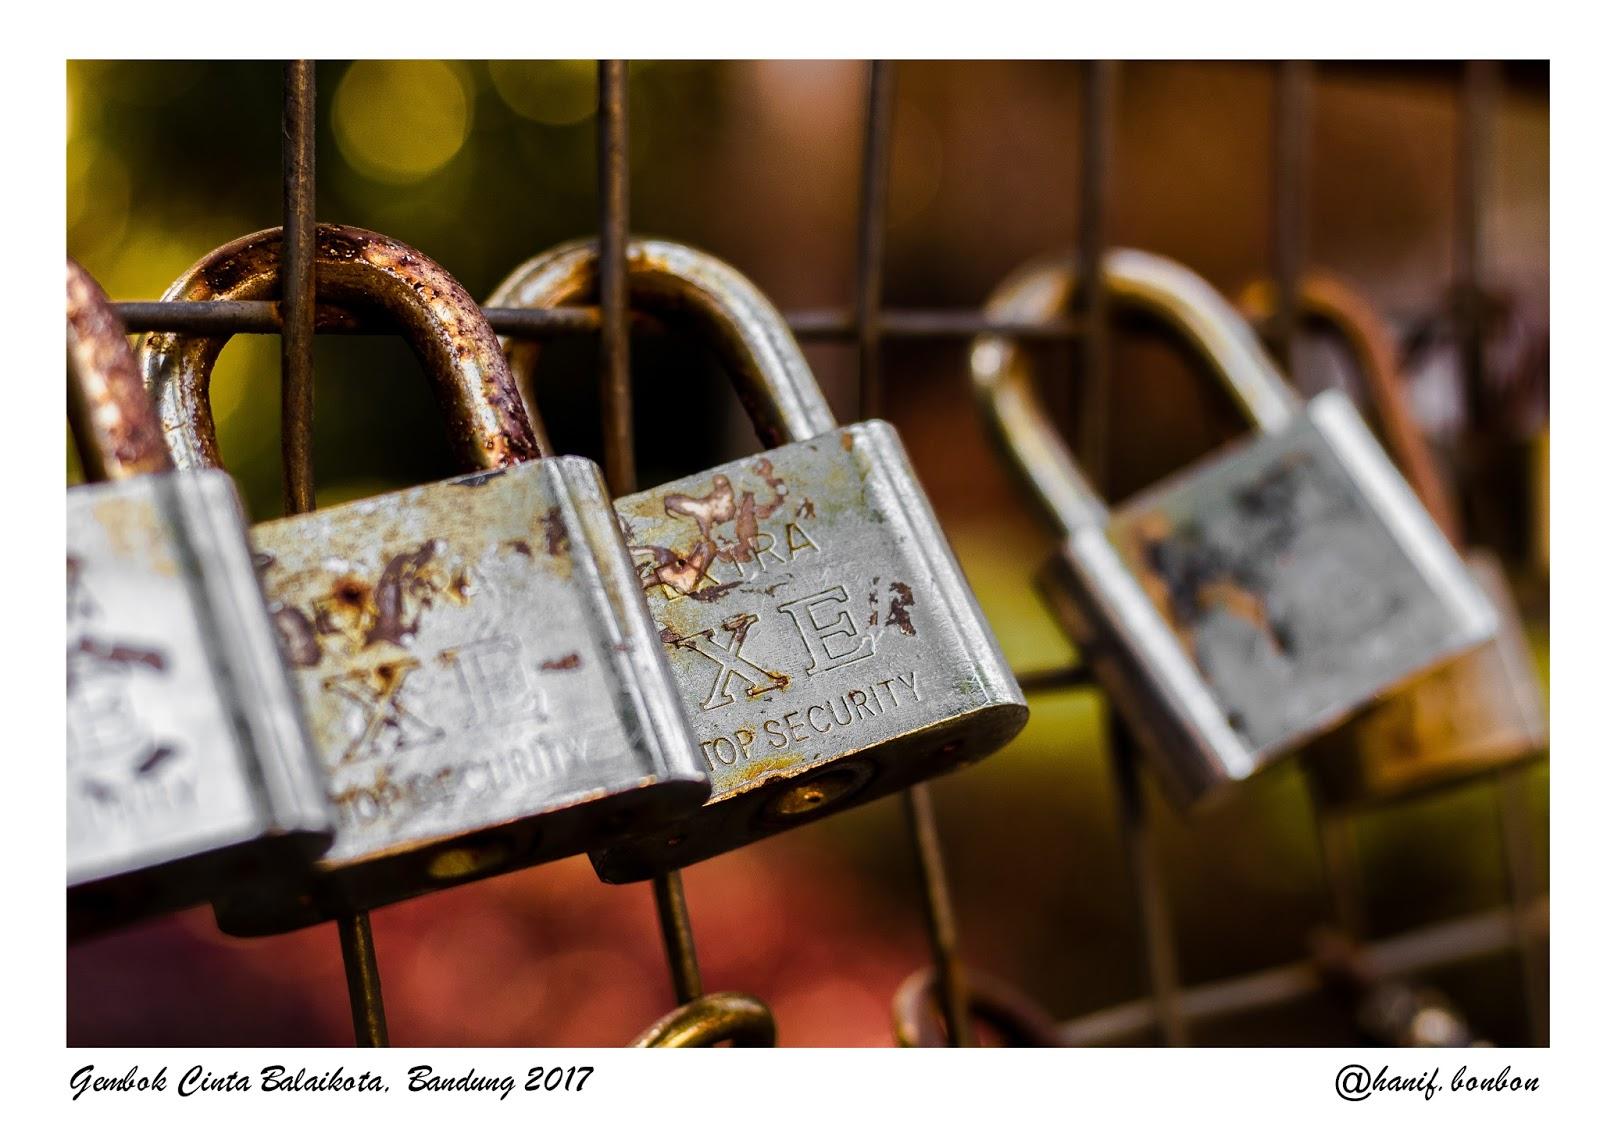 Belajar Dari Gembok Cinta Taman Balaikota Bandung